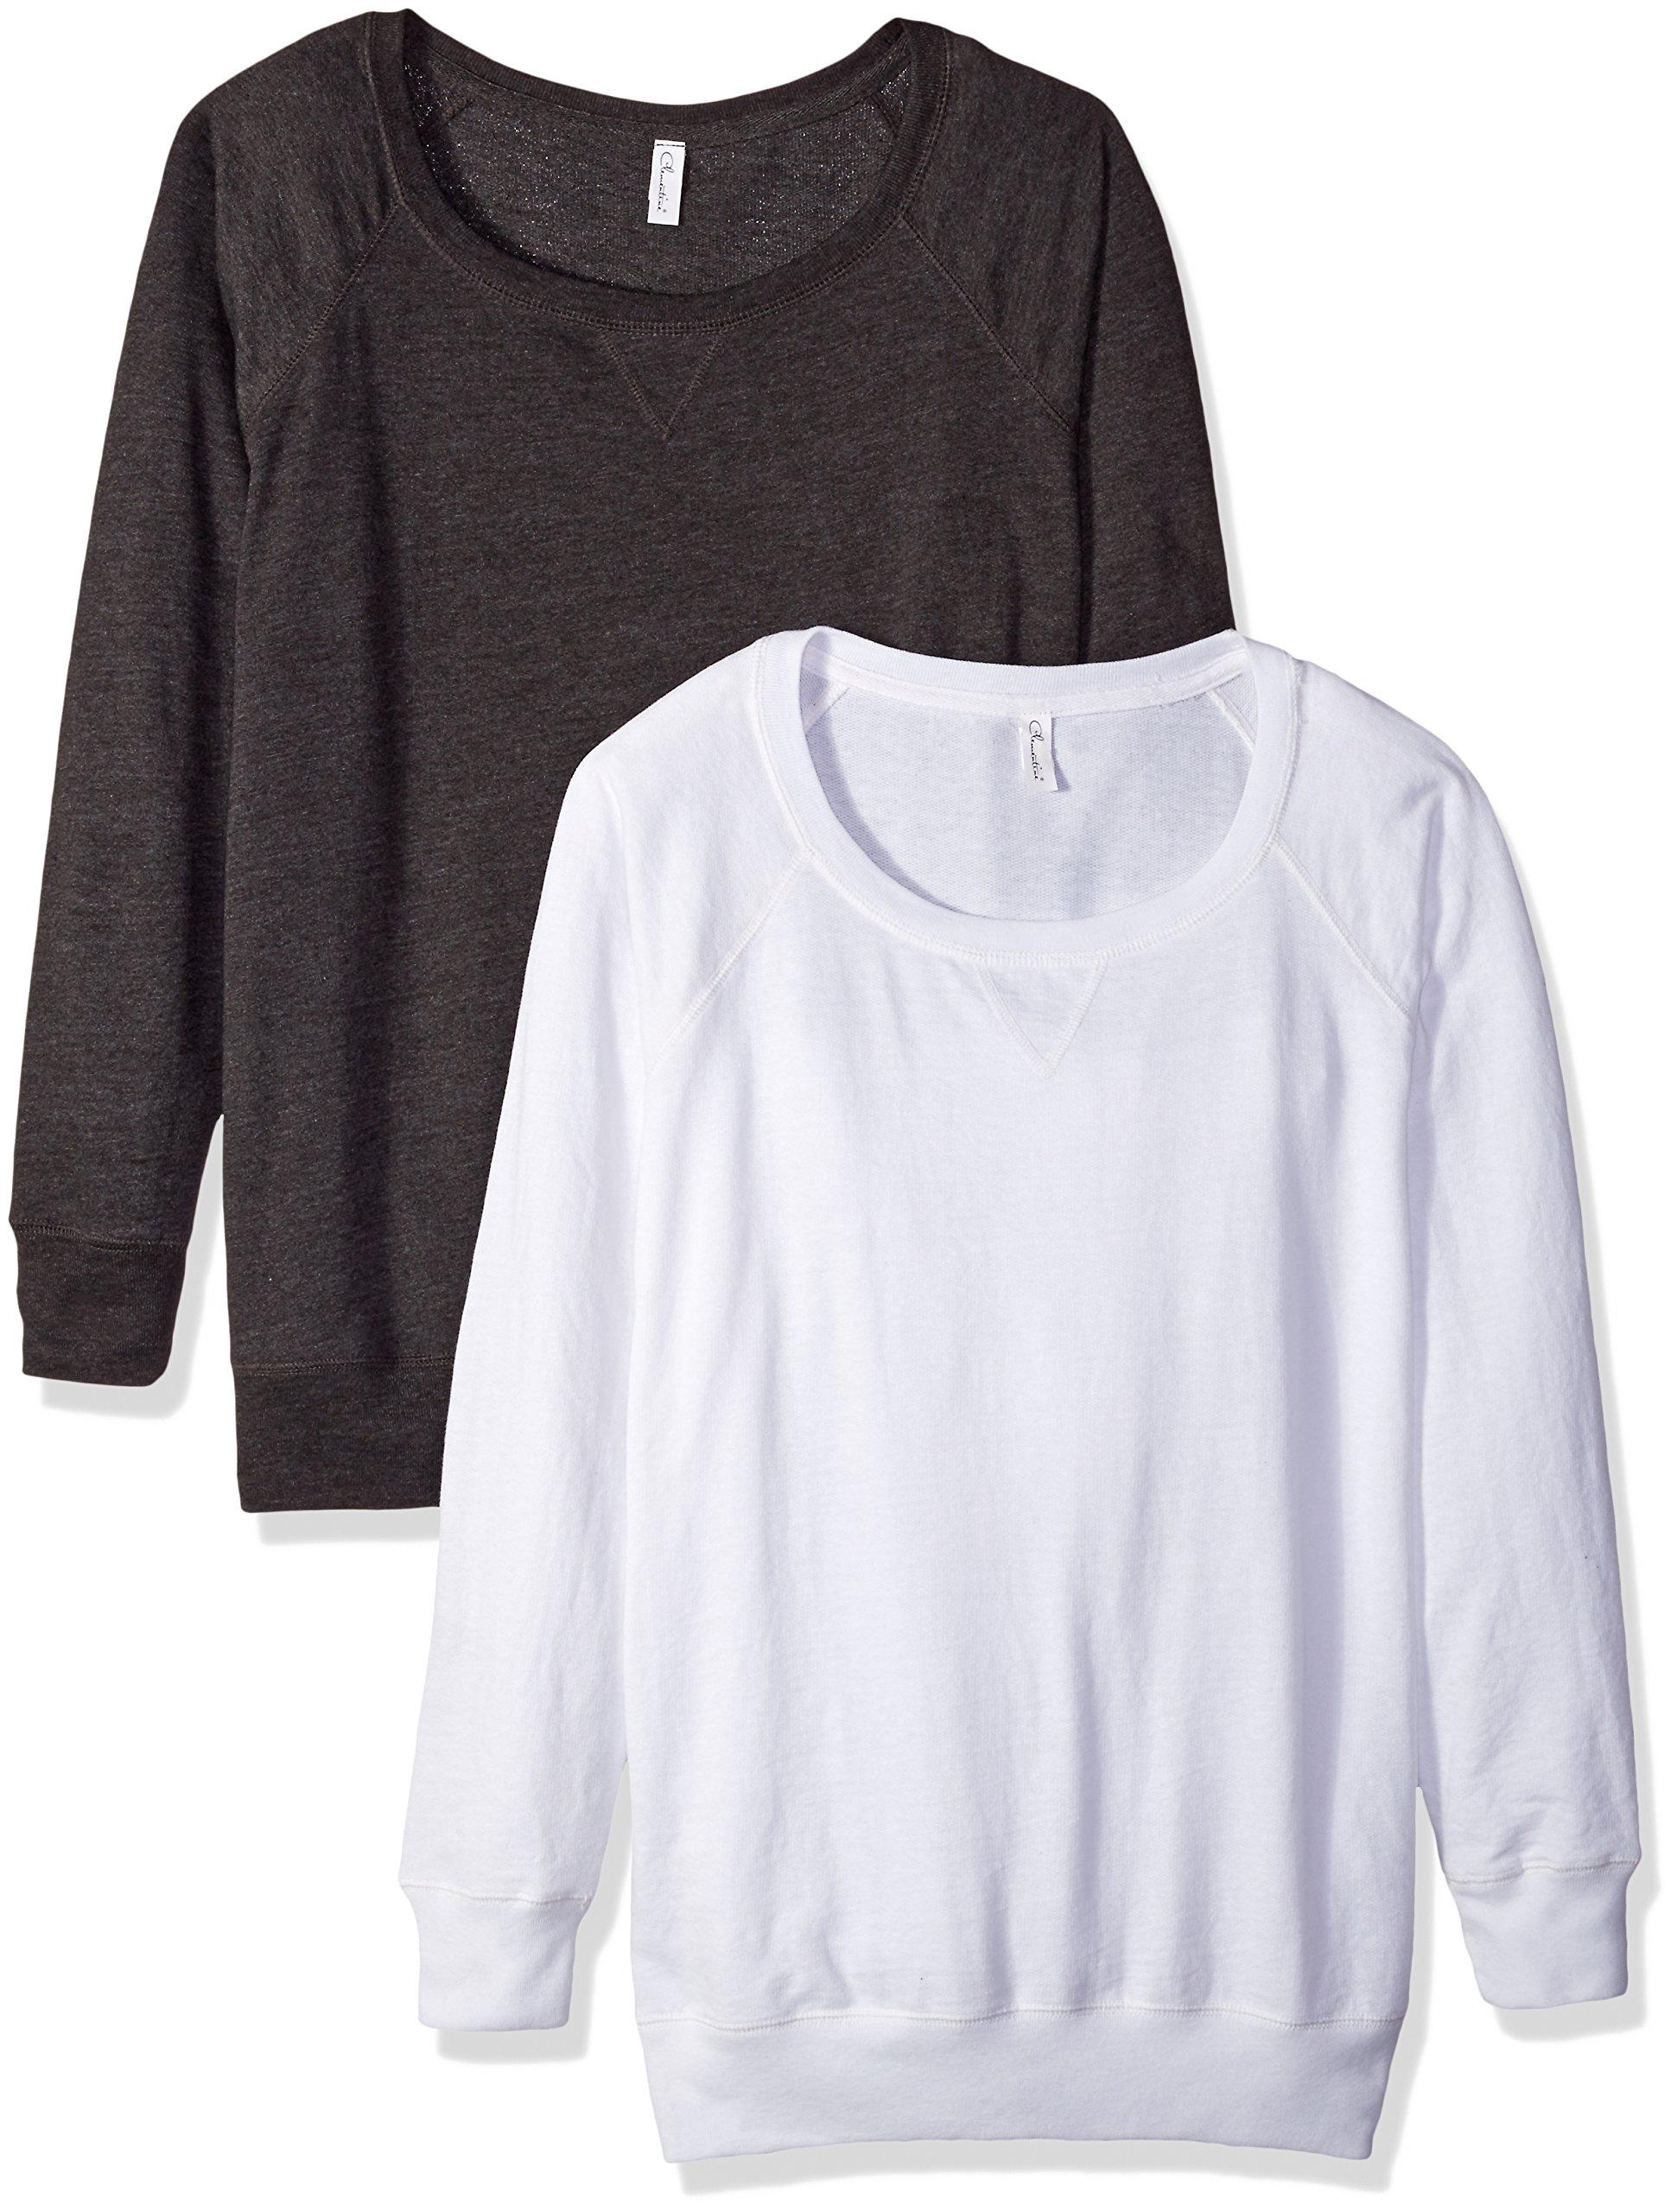 Clementine Apparel Women's Plus Ladies Curvy Slouchy Pullover Sweatshirt (2 Pack), Smoke/White, Size 1 (14-16)